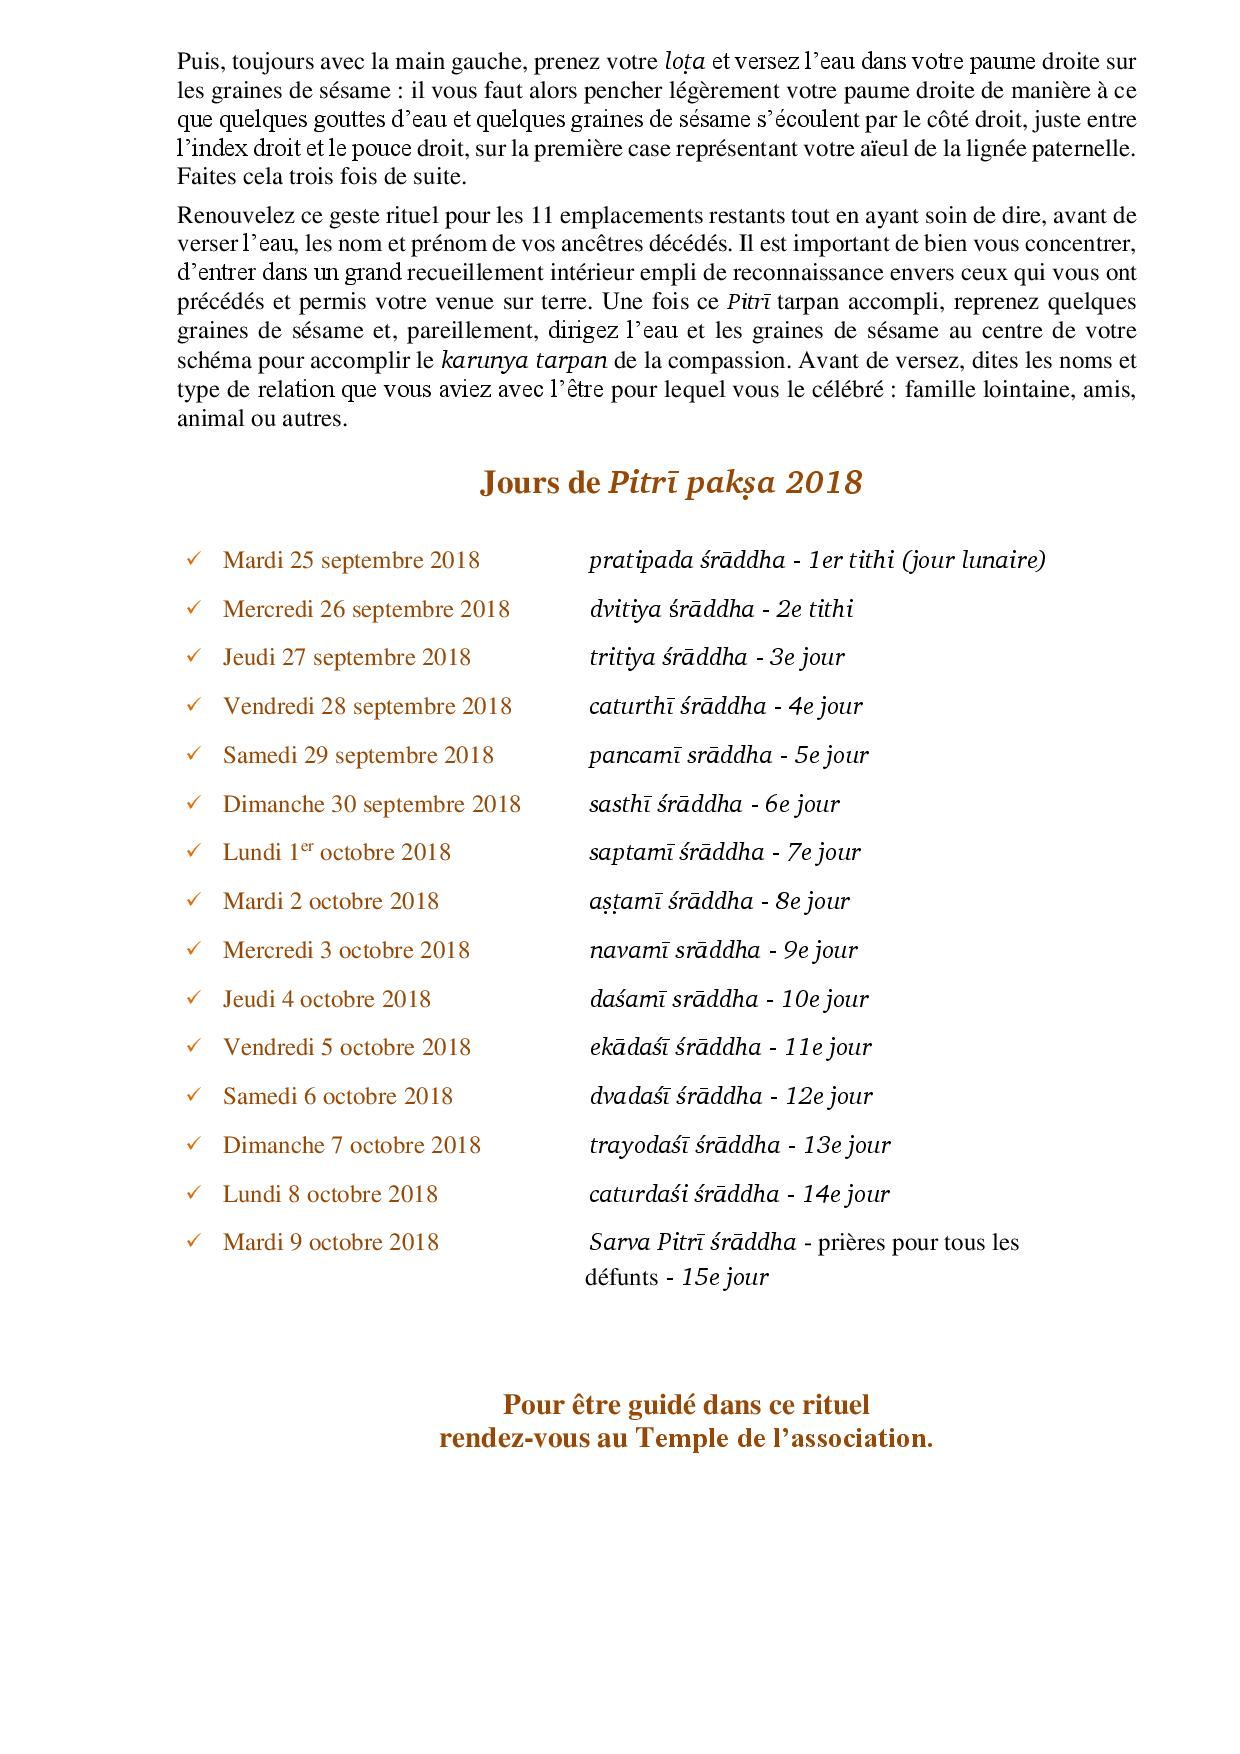 BAT PITRI PAKSHA SITE 25.09.2018-page-003